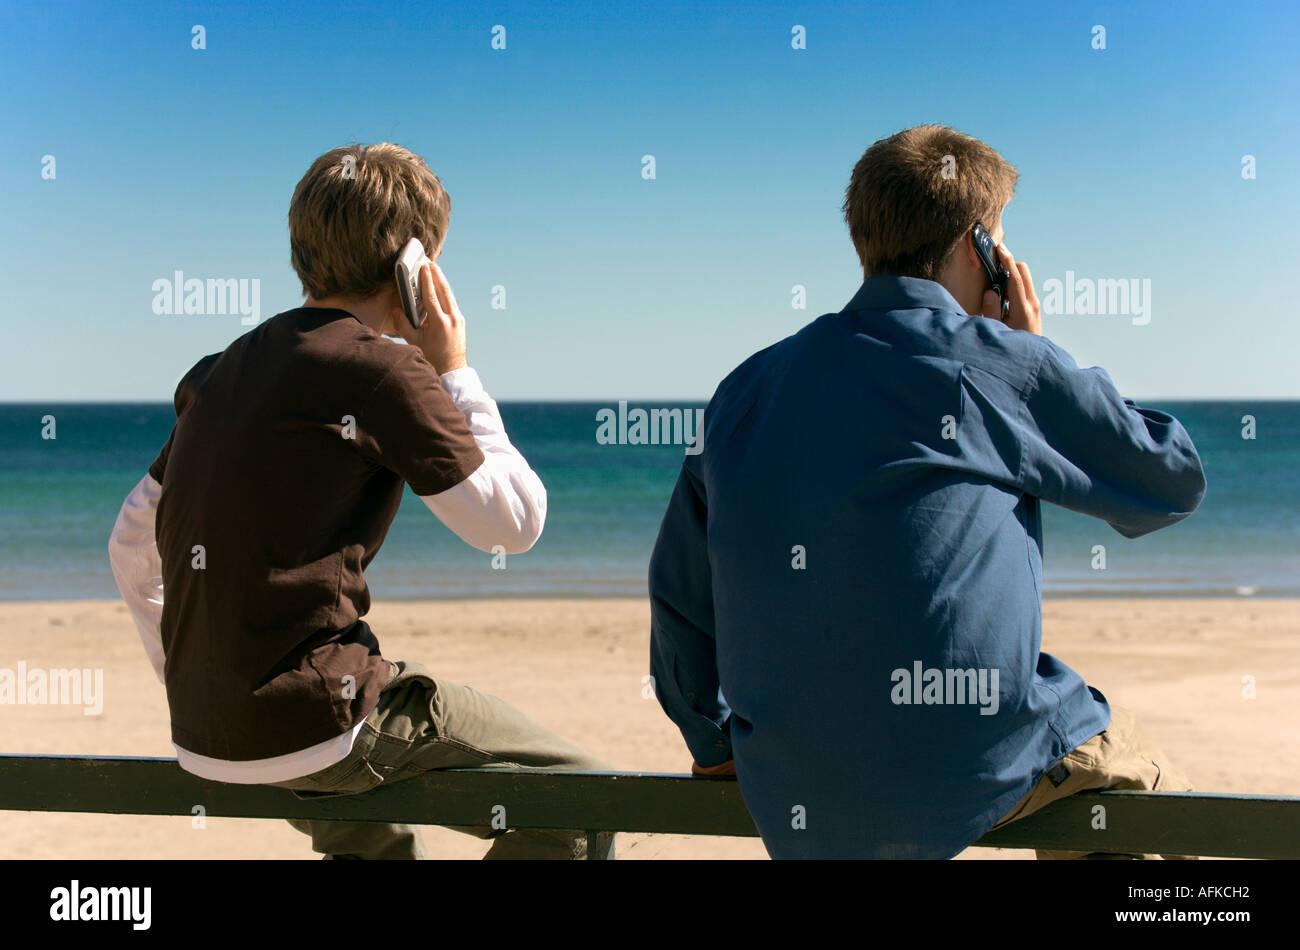 teenage-boys-using-mobile-phones-at-lake